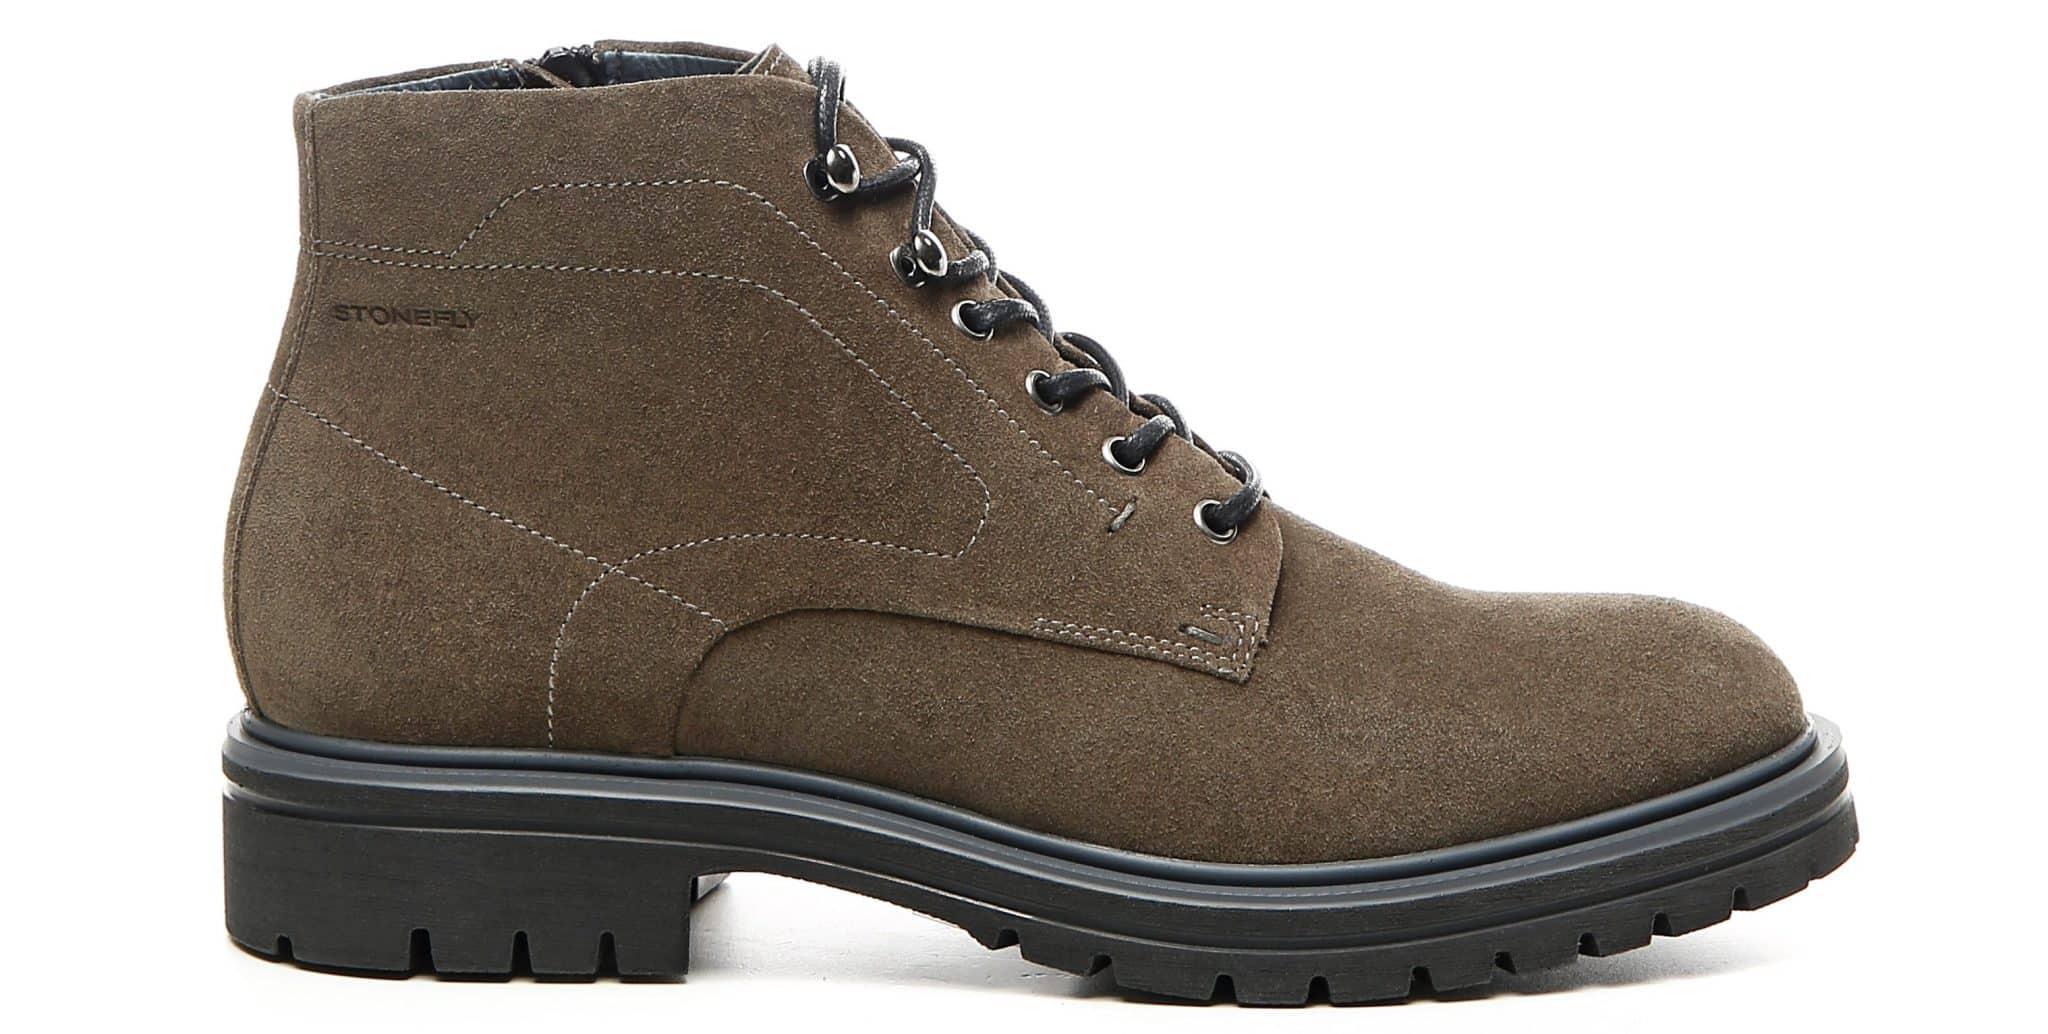 Stonefly inverno 2018 2019 uomo scarpe Alex 3